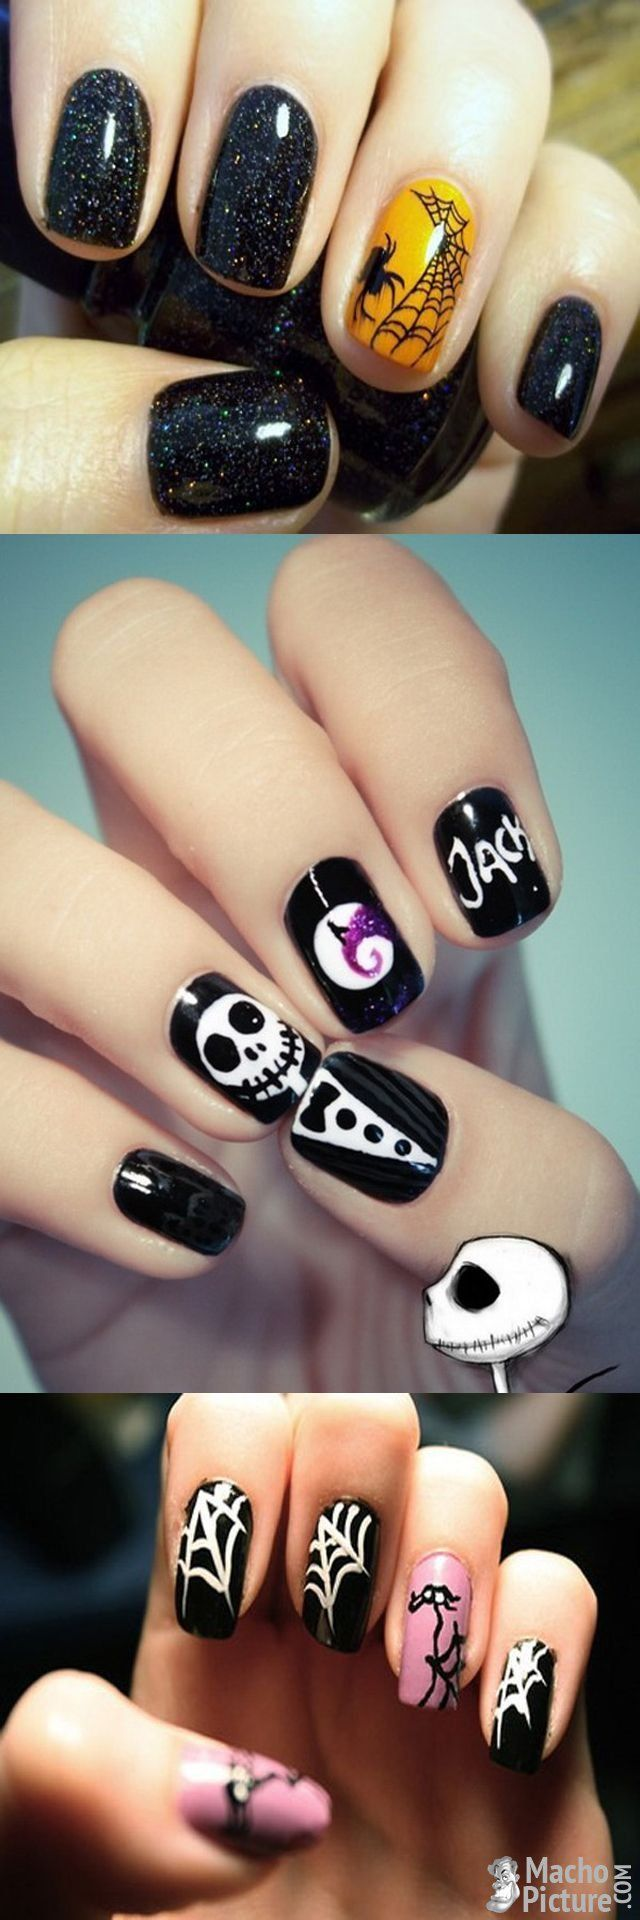 25+ Best Ideas About Halloween Acrylic Nails On Pinterest